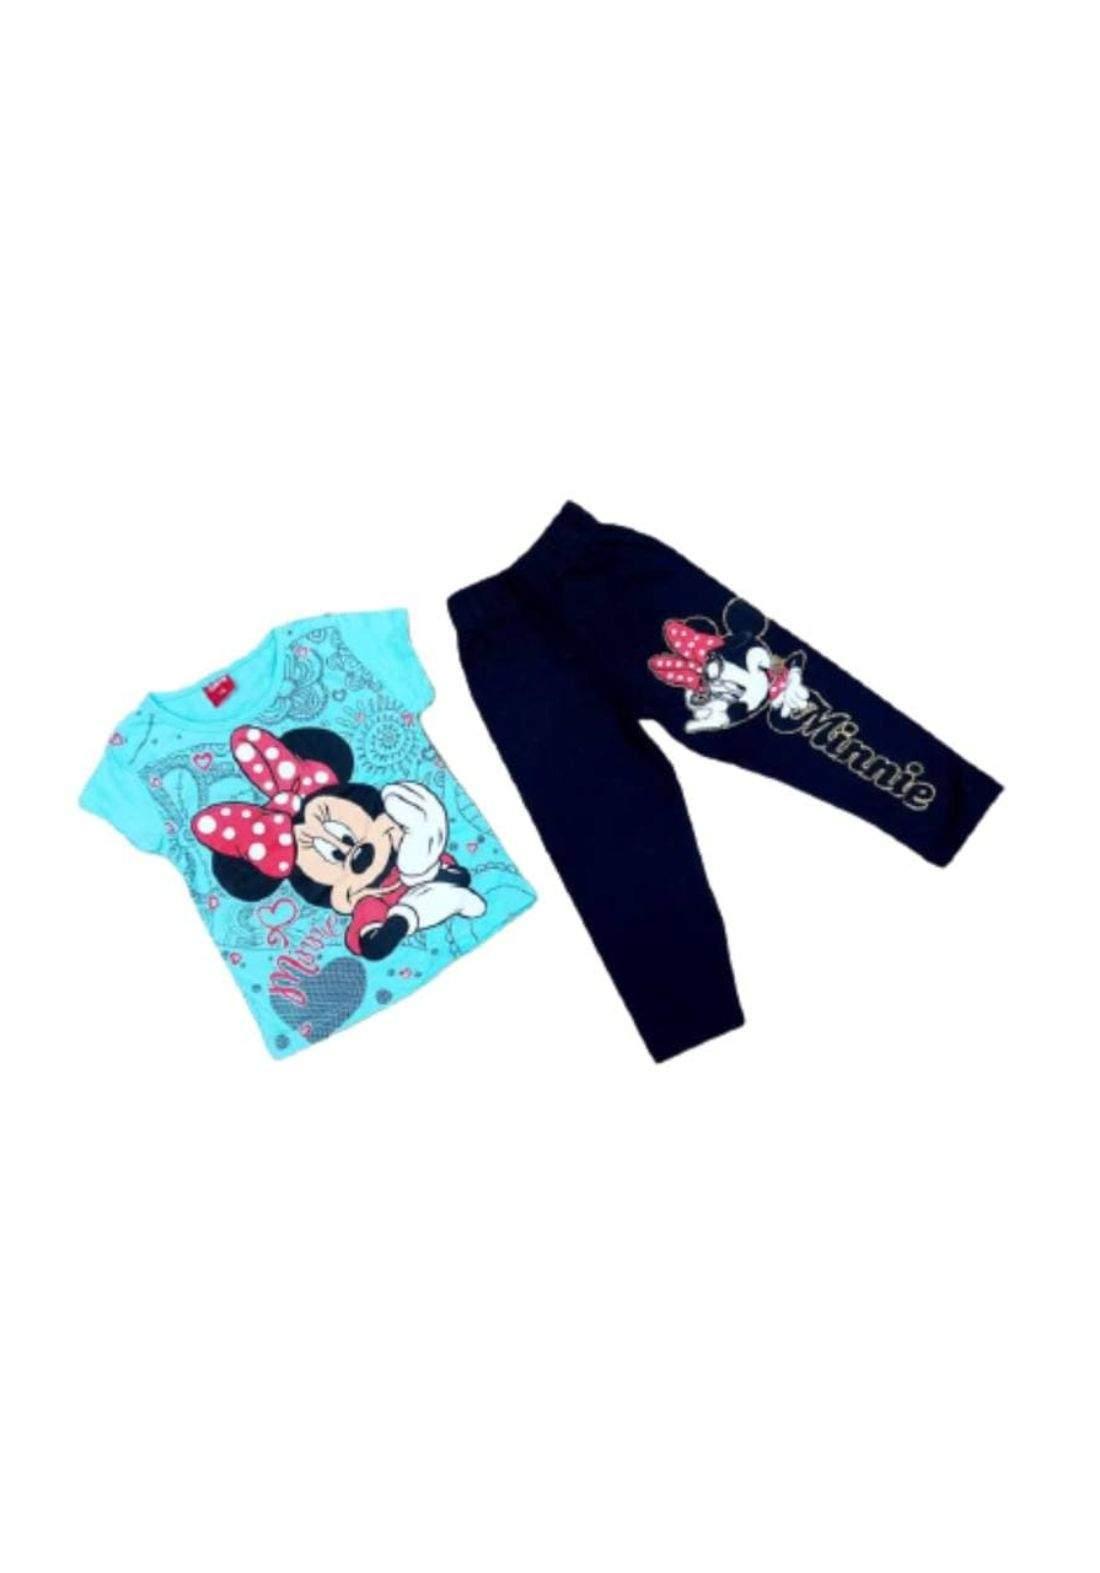 Tracksuit for girls blue (t-shirt+pijamas) تراكسوت بناتي تركوازي (بجامة+تيشيرت)